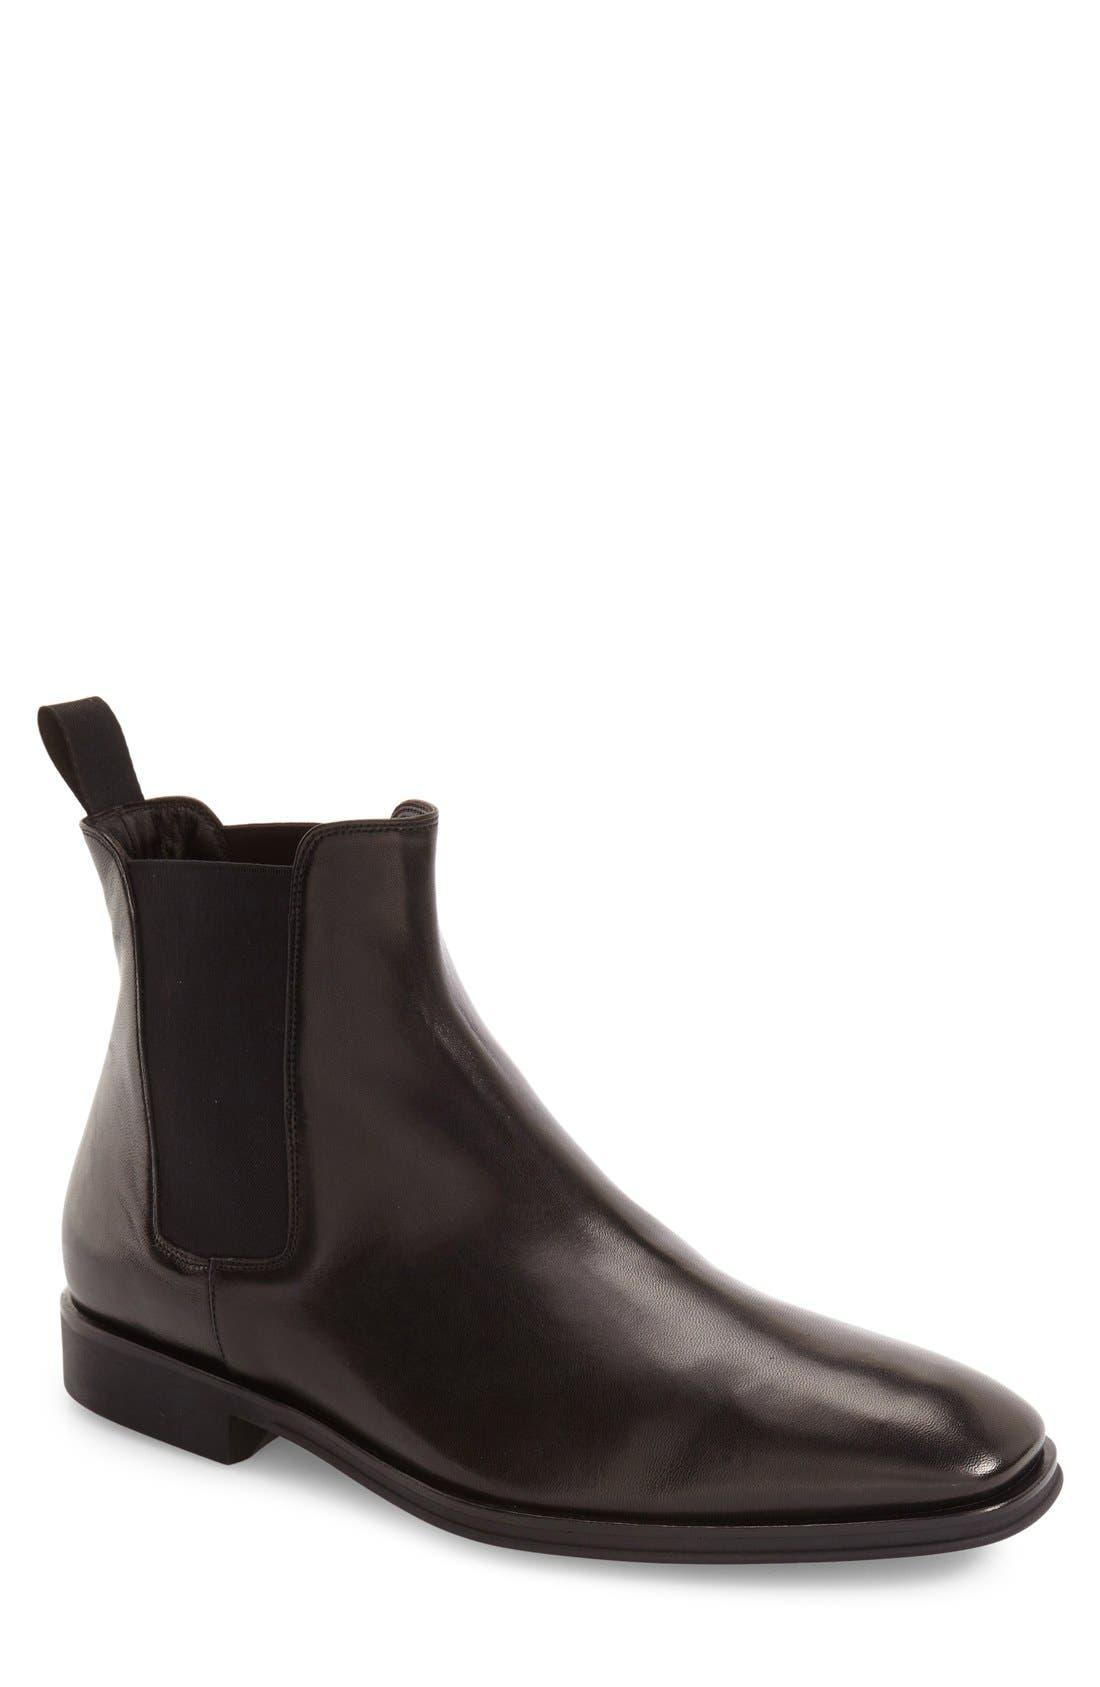 MONTE ROSSO Enrico Chelsea Boot, Main, color, 001